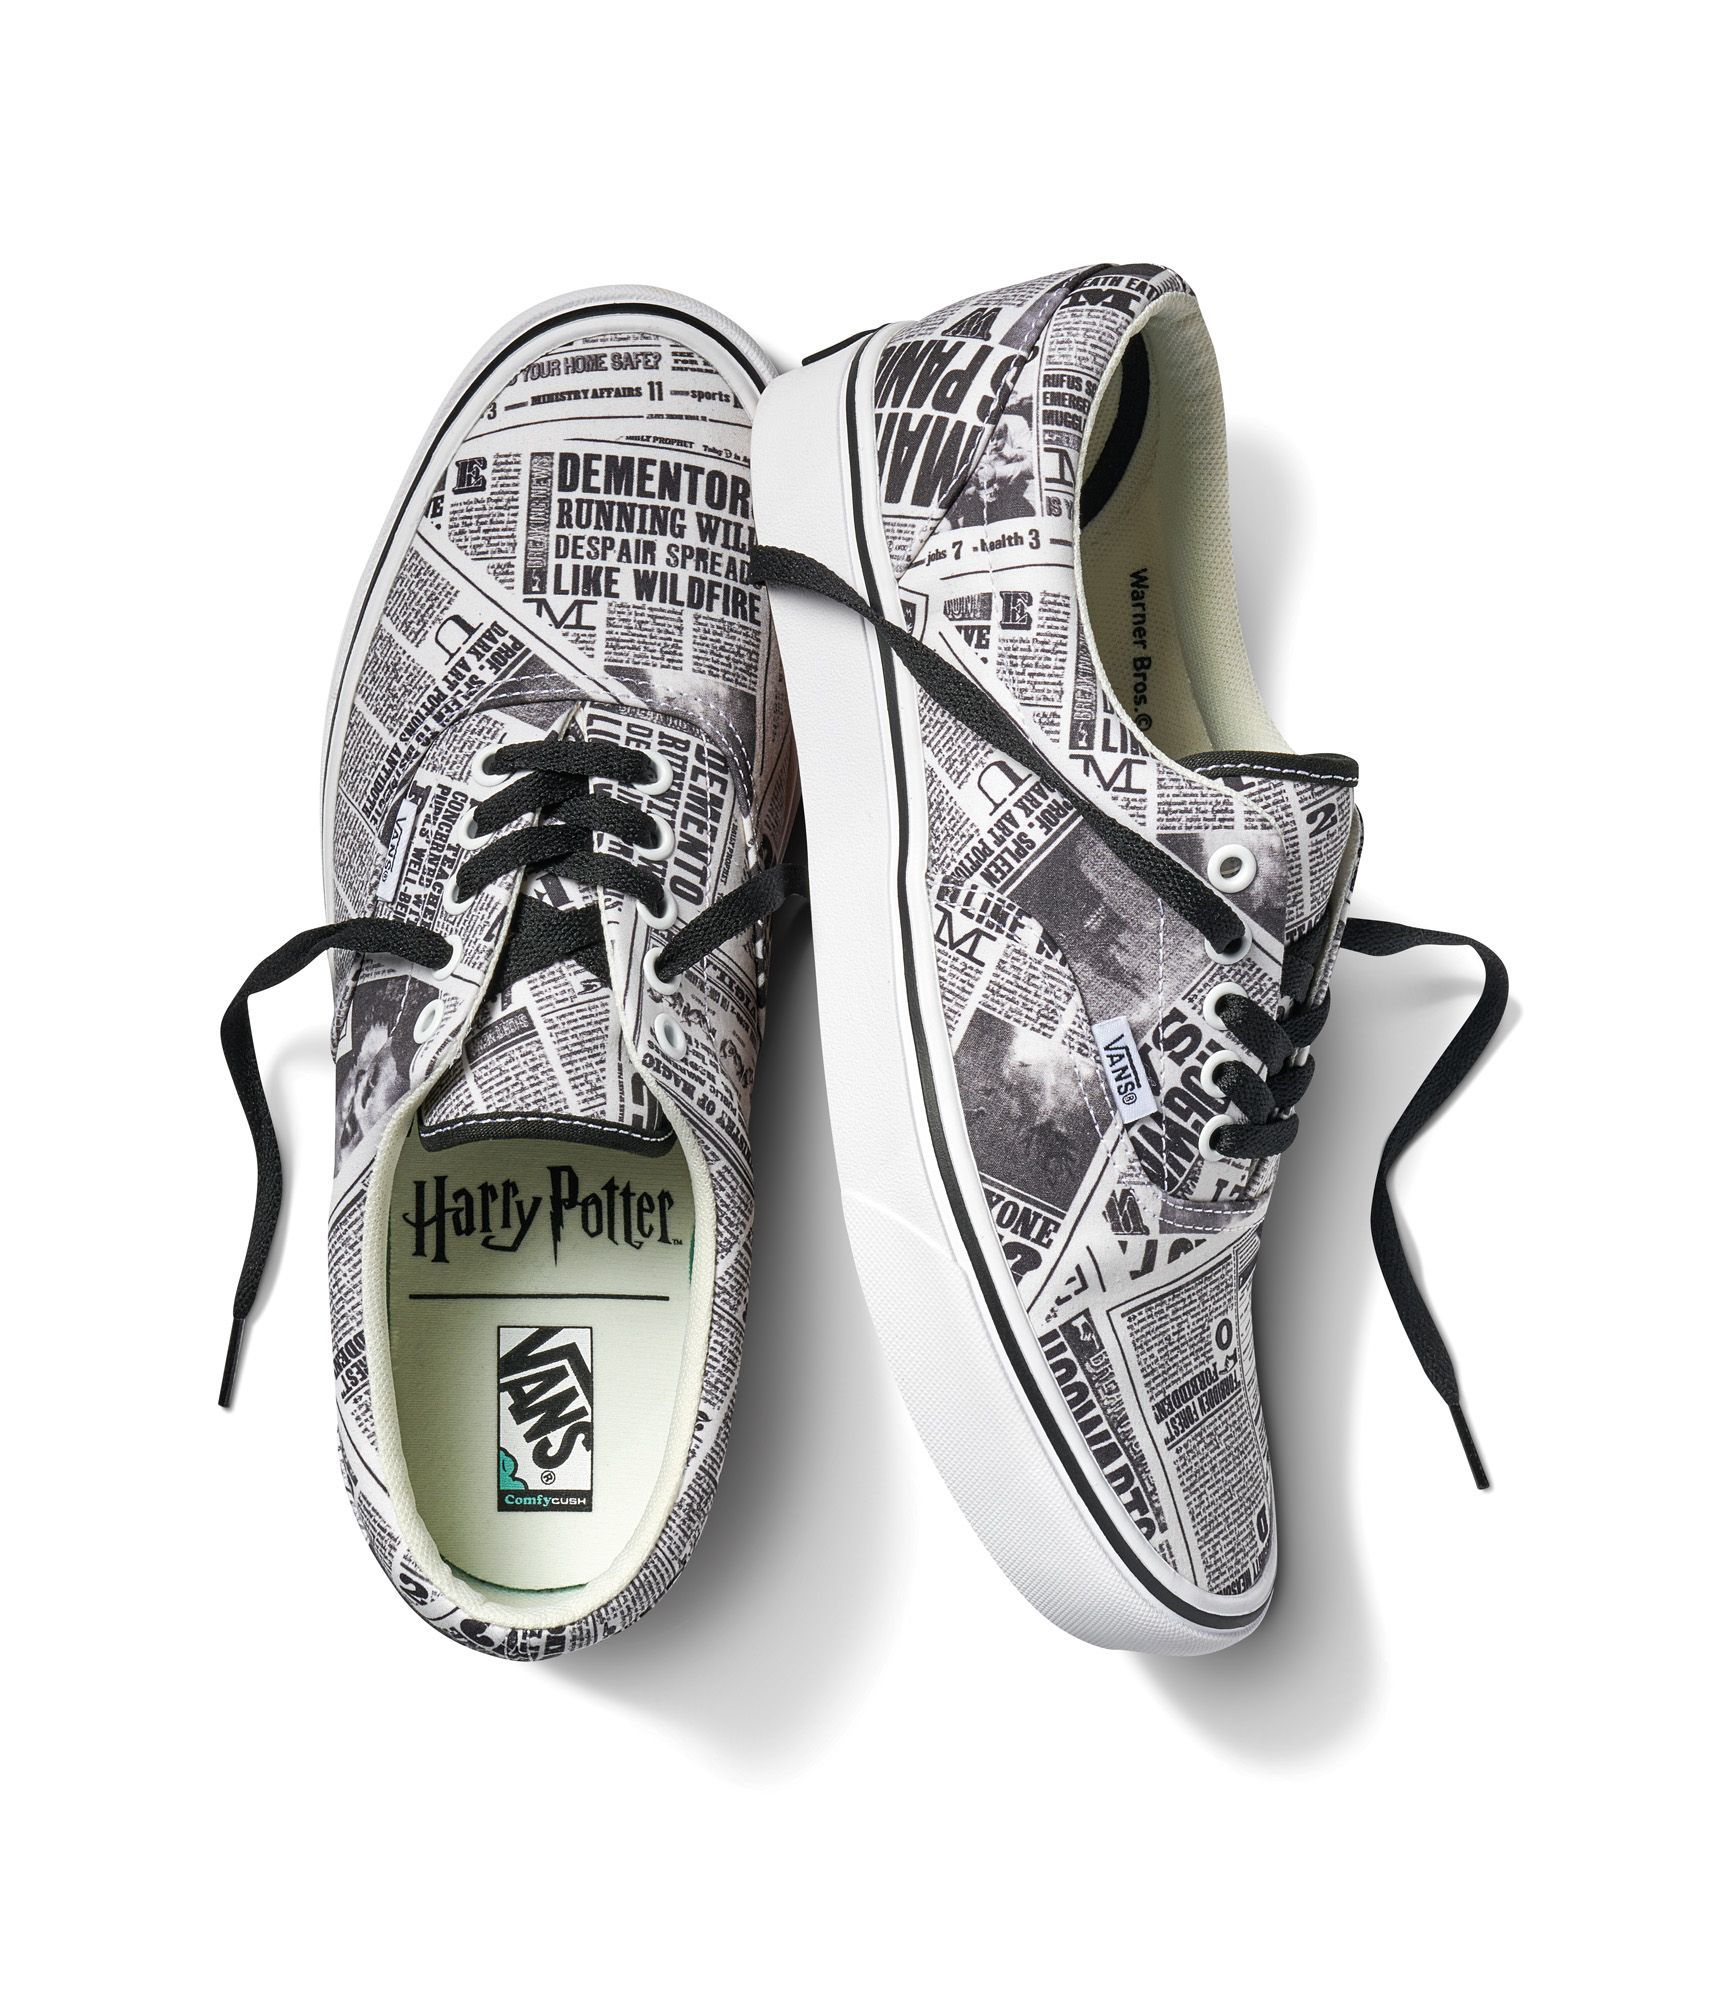 zapatillas vans de harry potter